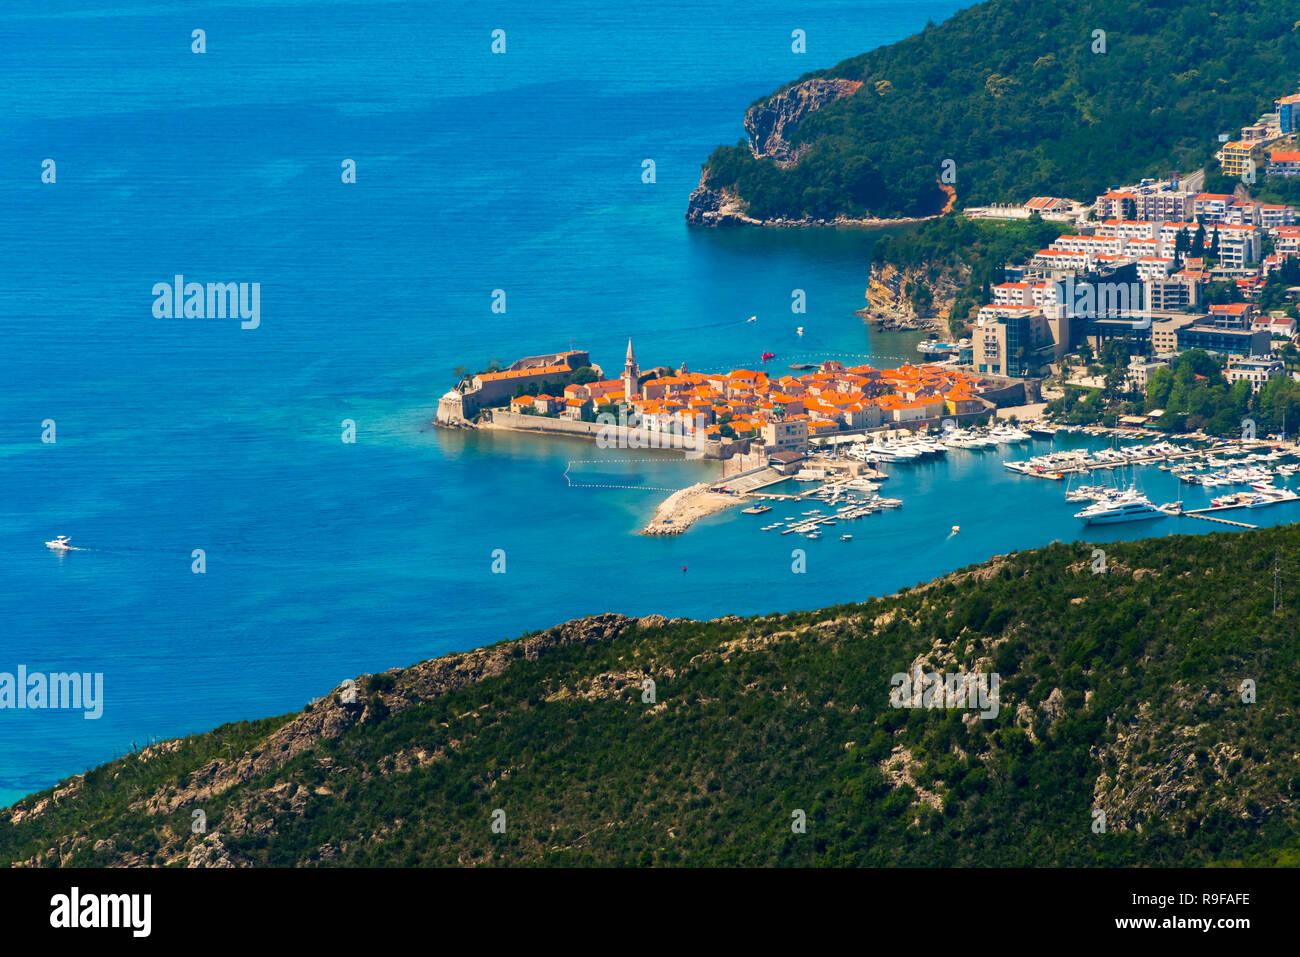 Budva along the Adriatic coast, Montenegro - Stock Image